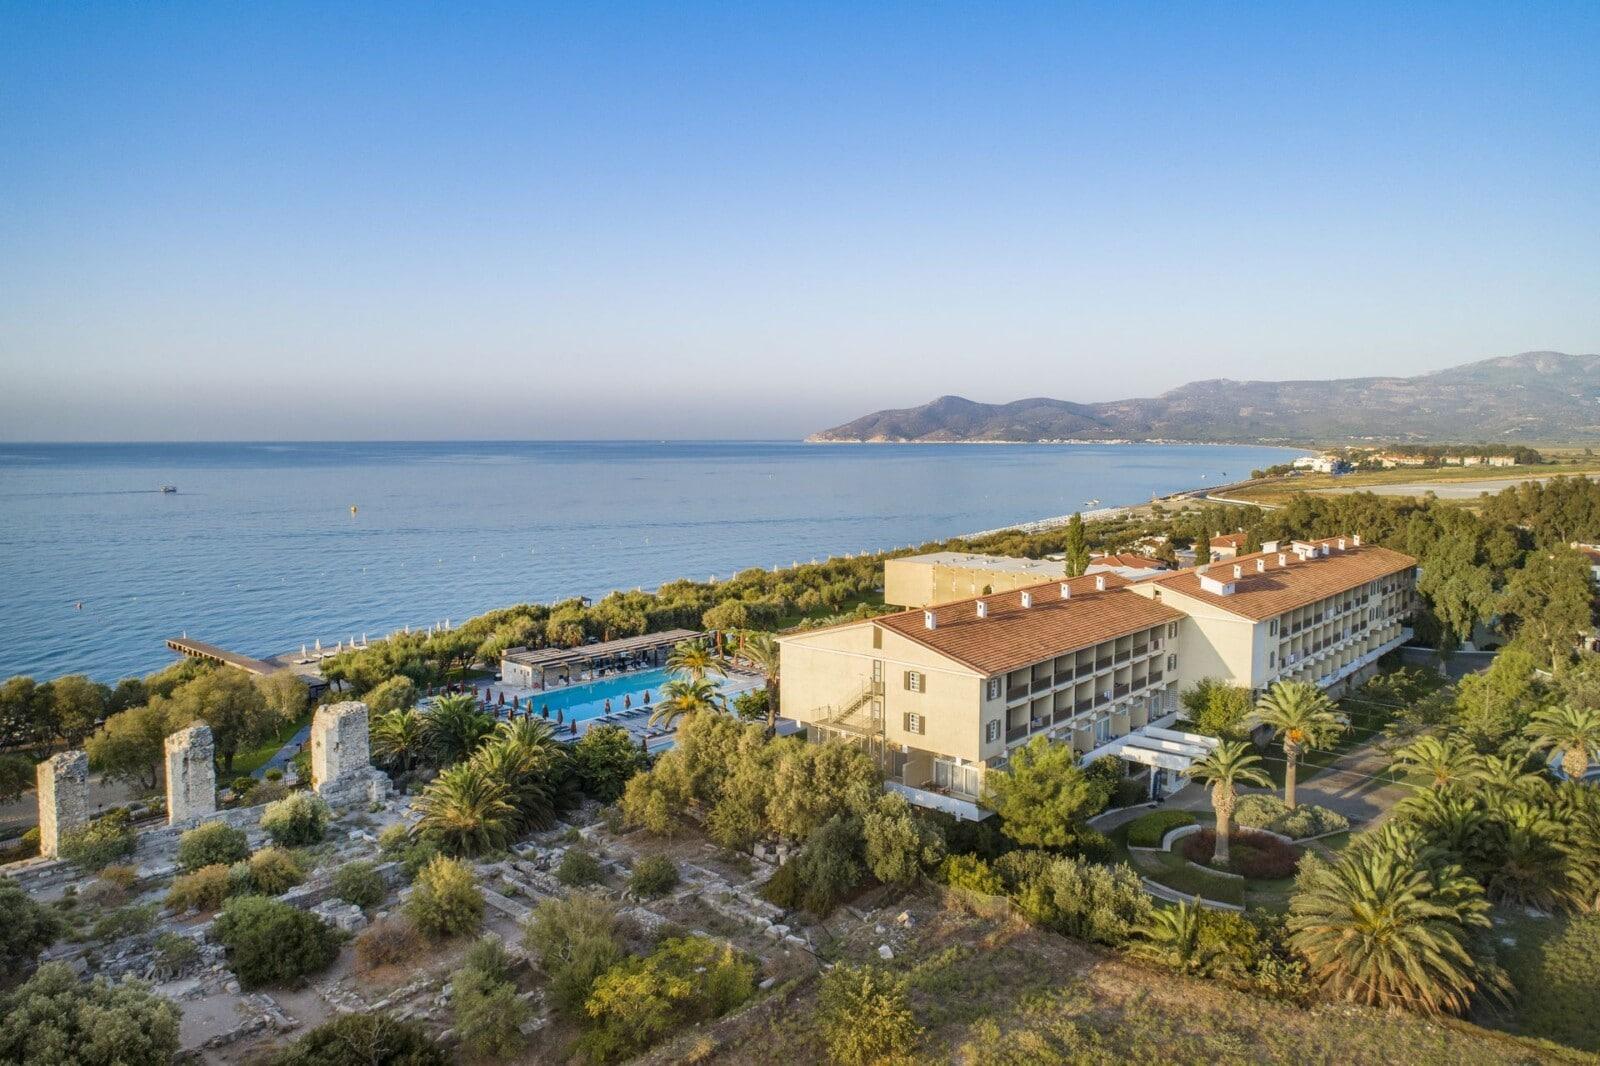 Aerial photo of Doryssa Seaside, a luxury beachfront resort in pythagoreio samos